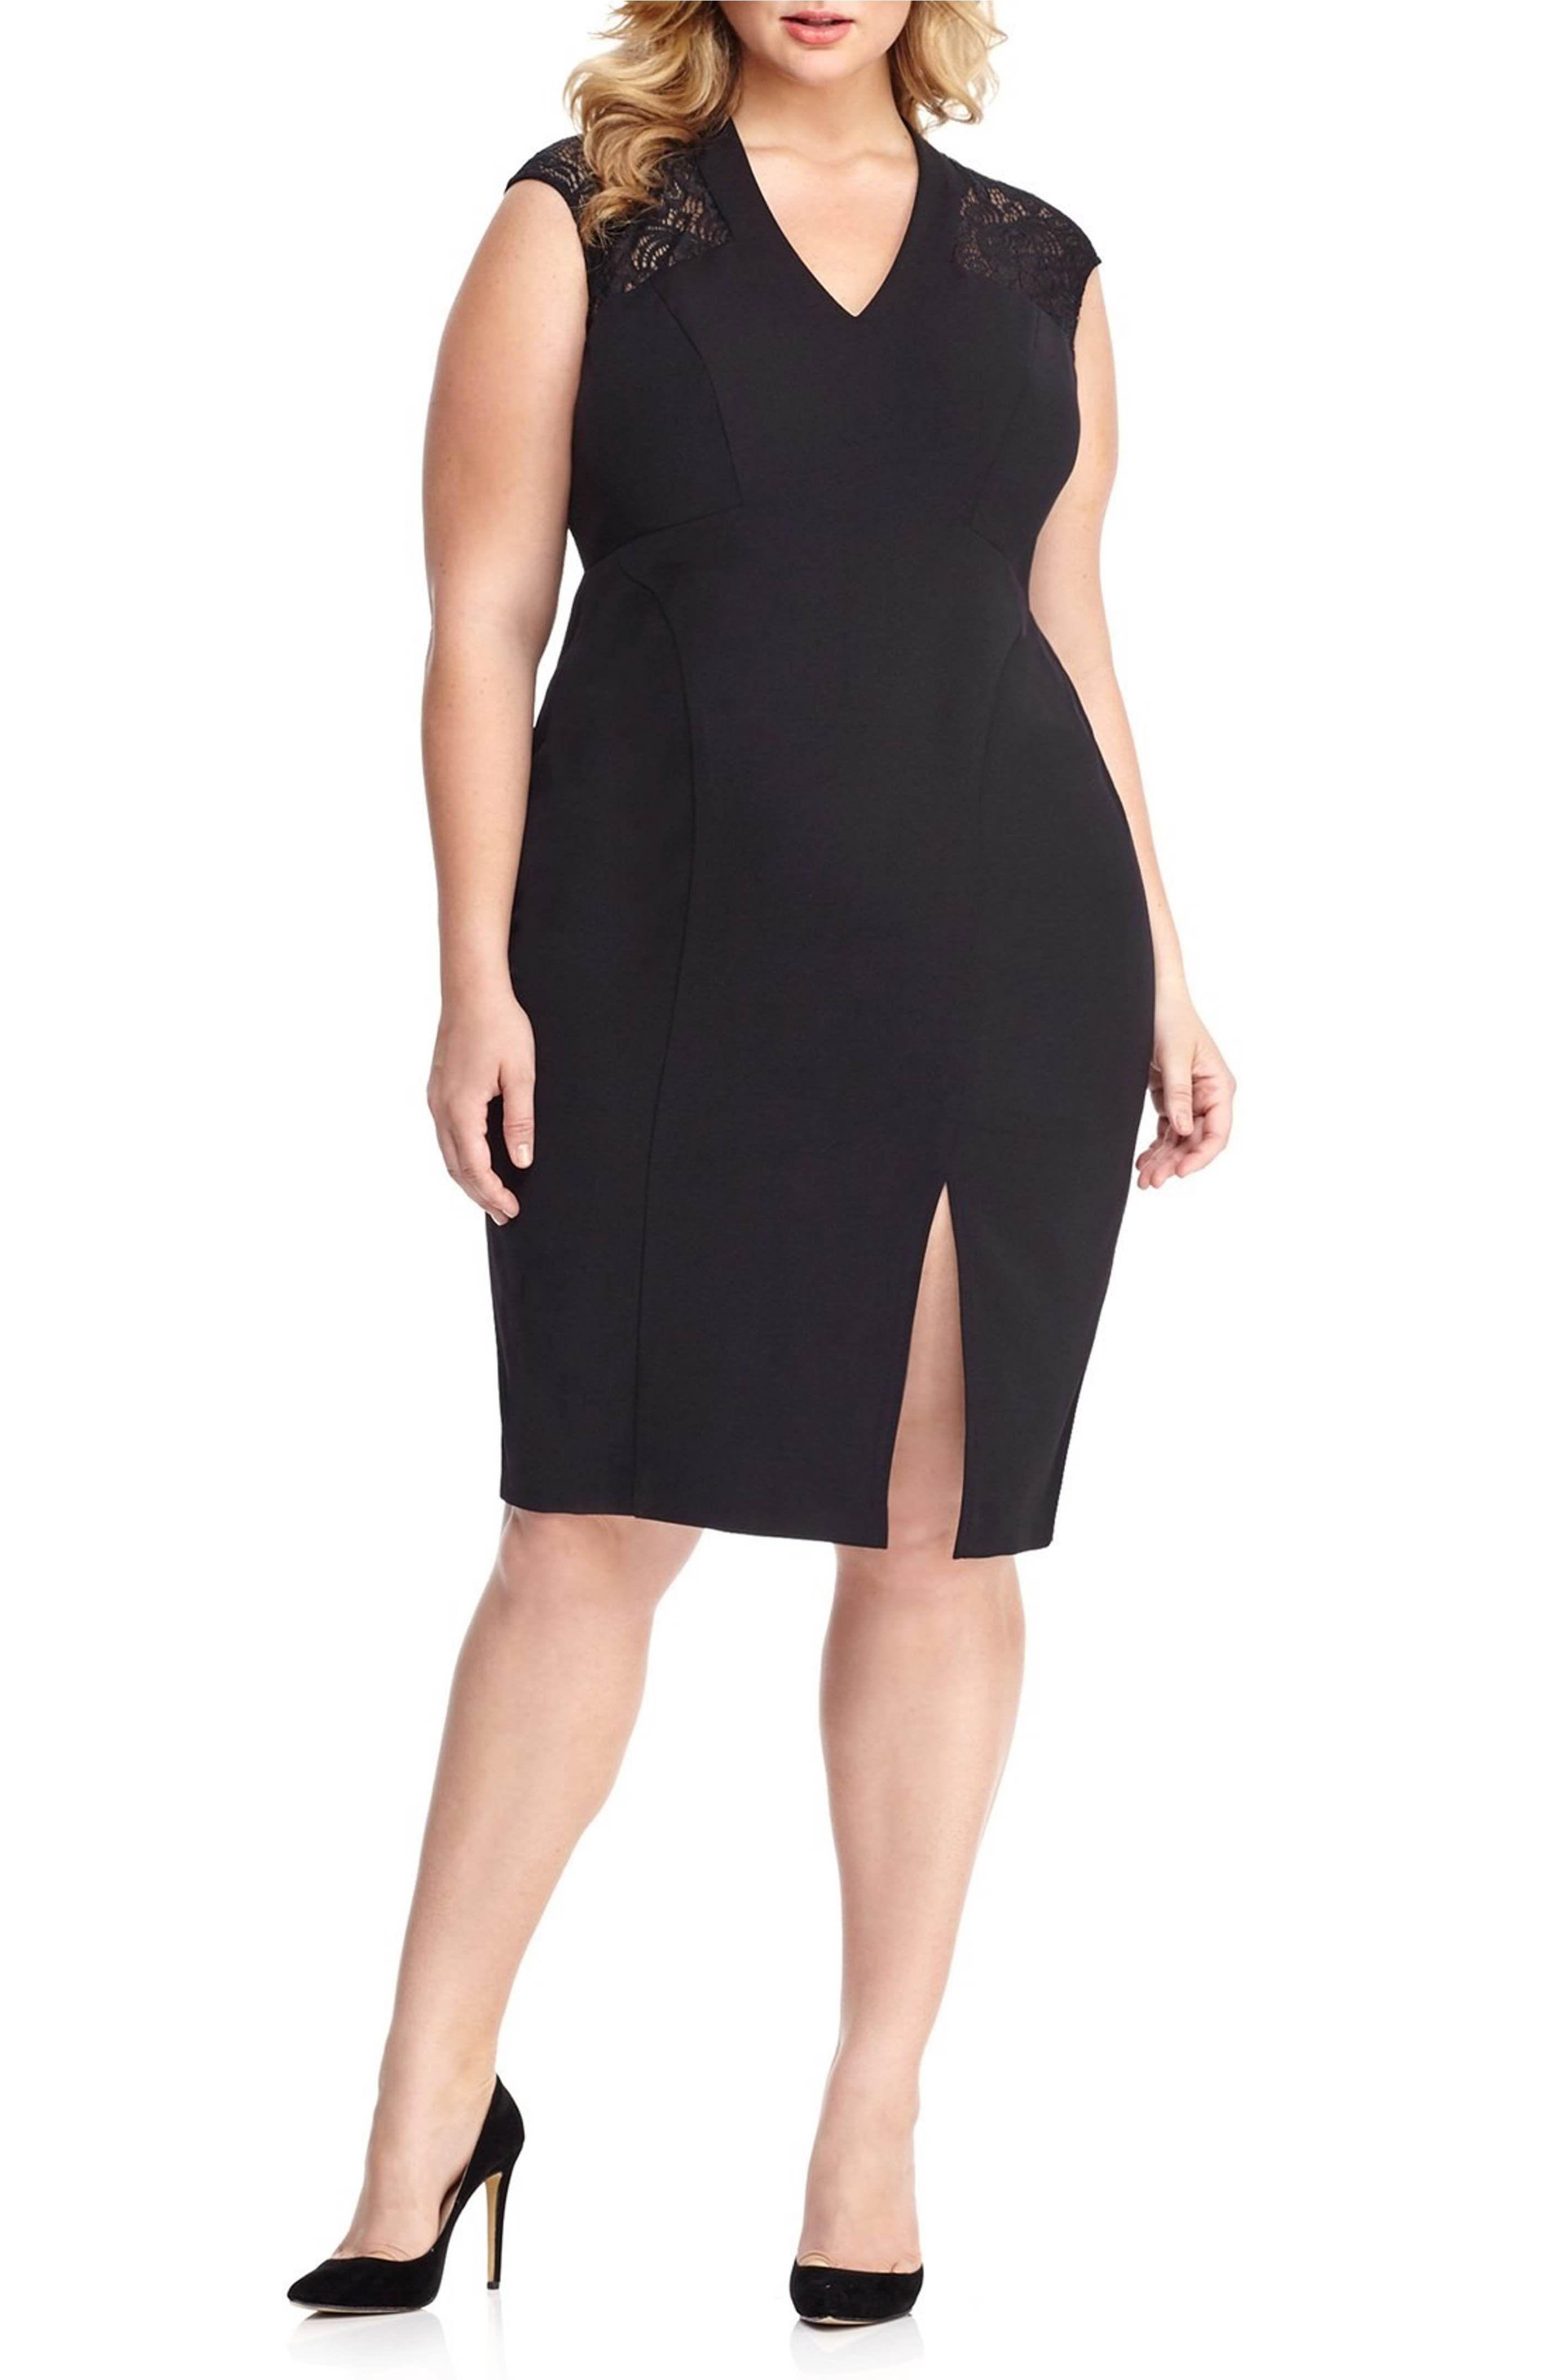 Main Image London Times Sheath Dress Plus Size Plus Size Wedding Guest Dresses Plus Size Dresses Plus Size Women